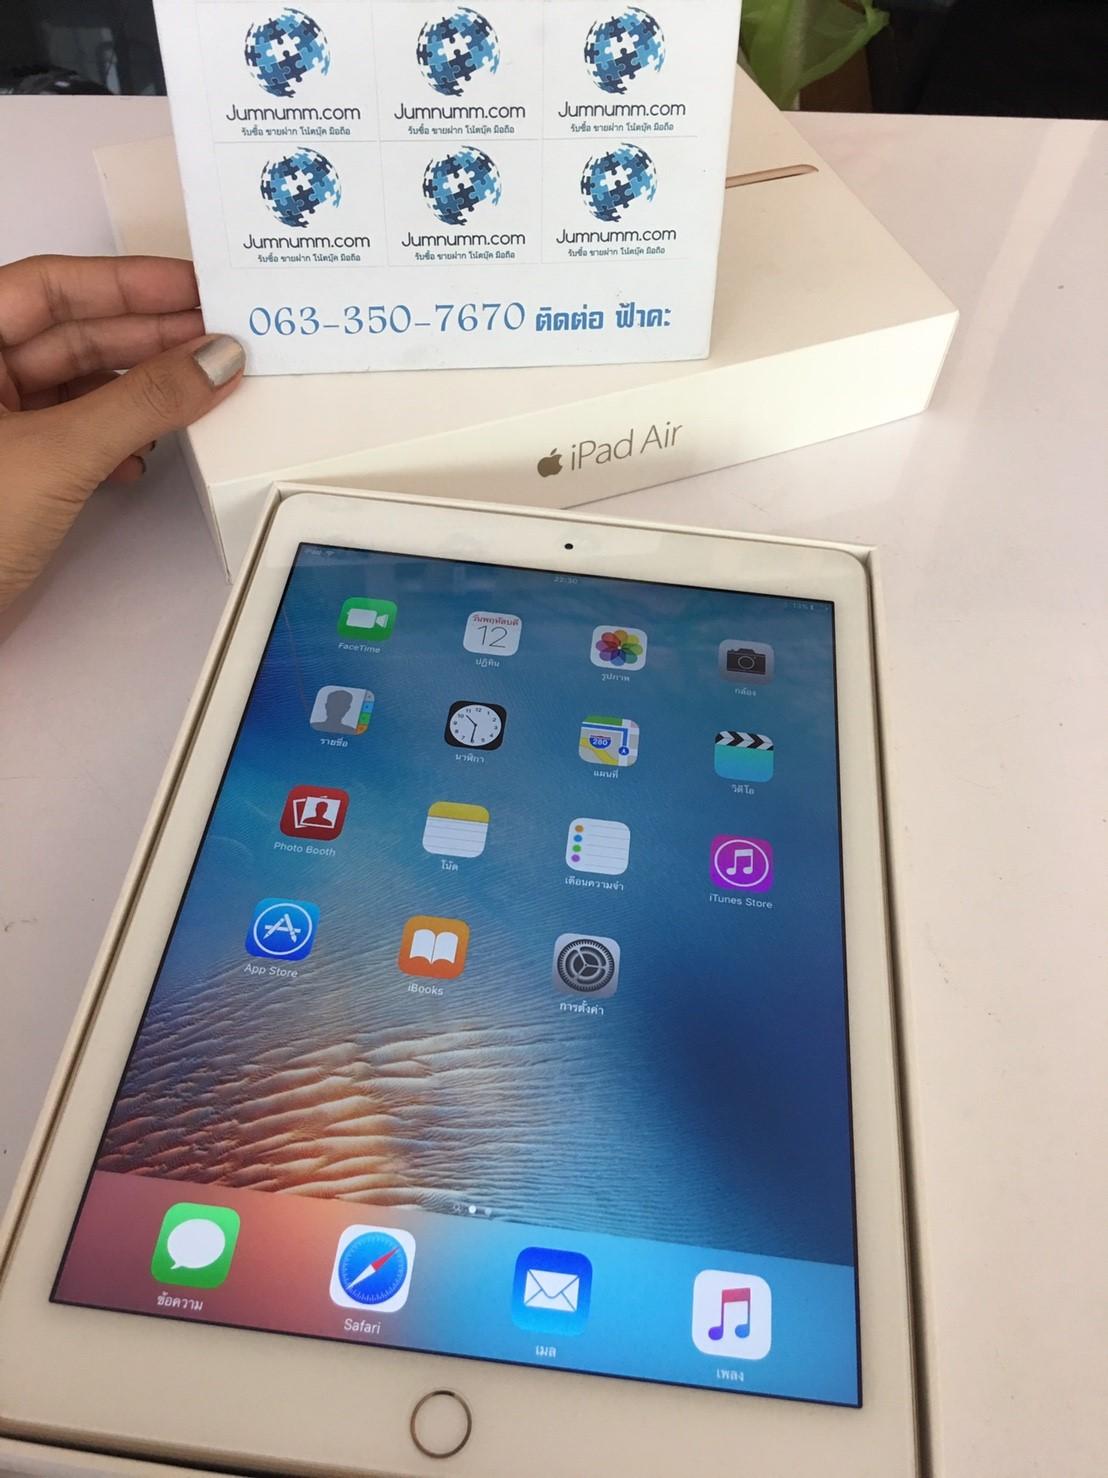 IPad Air 2 16GB Wifi Gold สภาพนางฟ้า ราคา 9,500 บาท ยกกล่อง